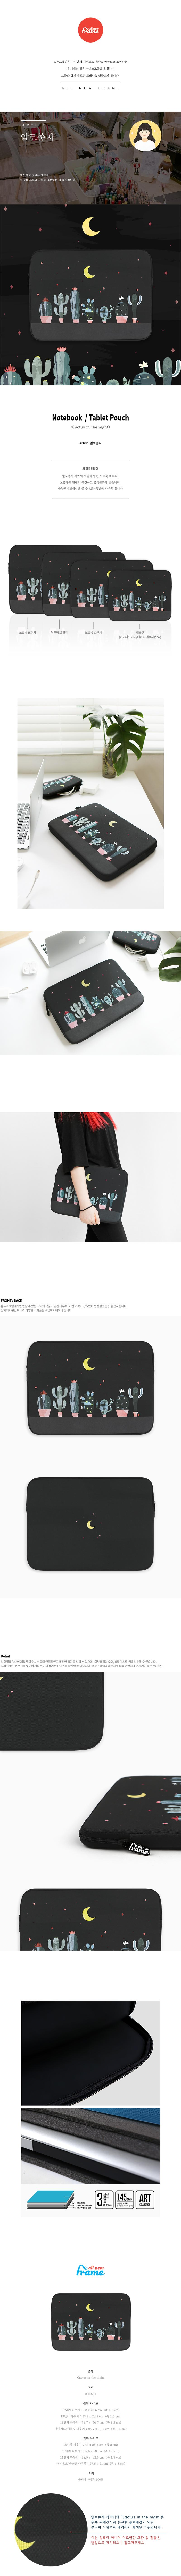 Cactus in the night (아이패드-11-13-15형) - 올뉴프레임, 23,000원, 노트북 케이스/파우치, 27.94cm~33.78cm